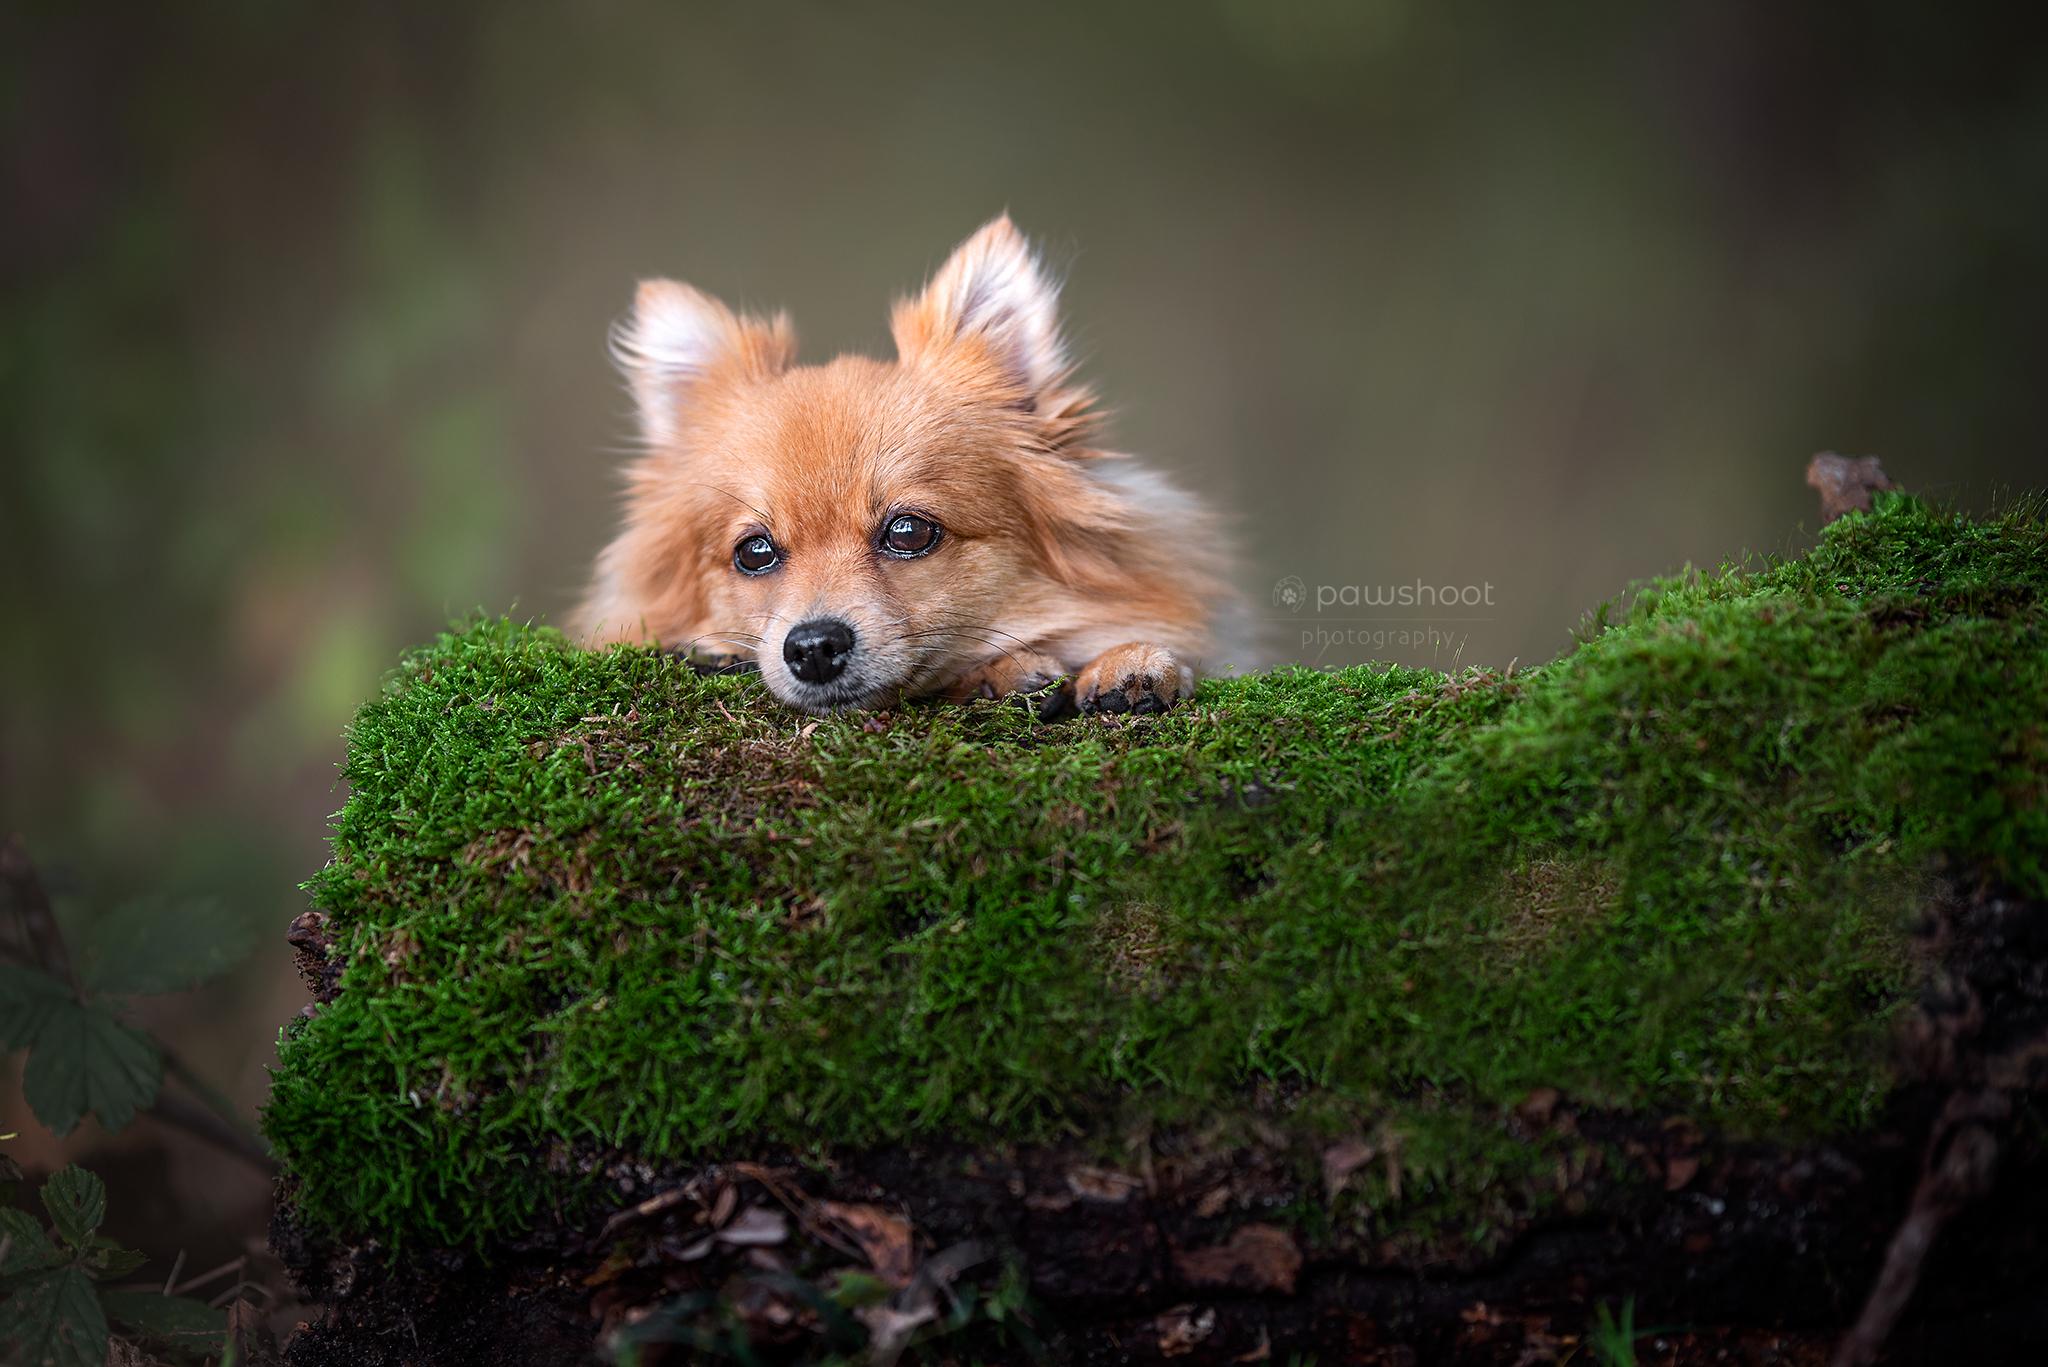 dwergkees op mos Pawshoot hondenfotografie